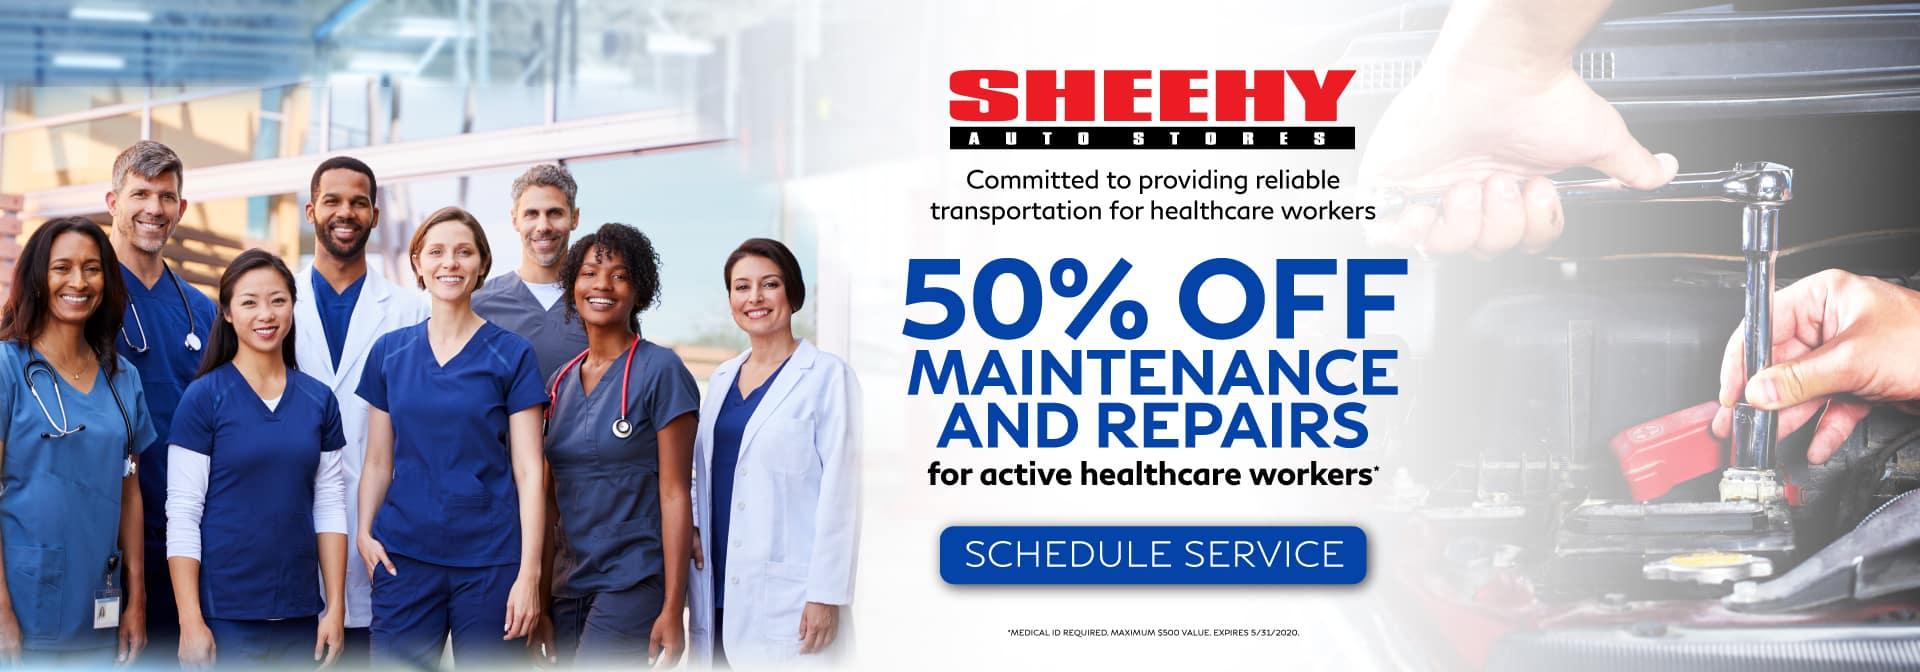 INFINITI HealthcareServiceSpecial APR2020 1920x672 webslider